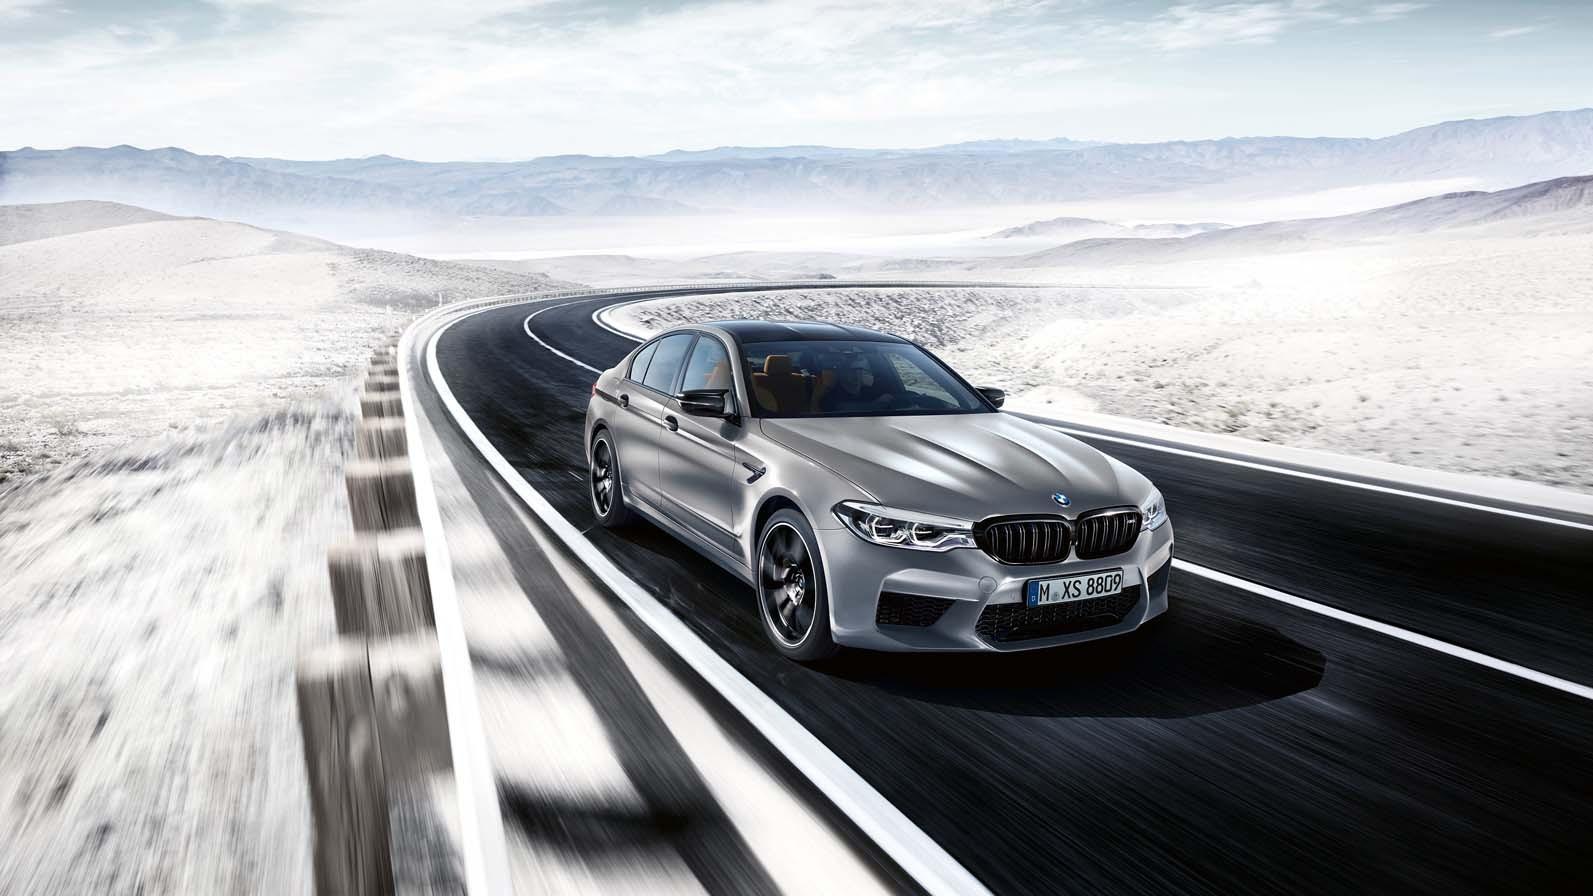 2019 BMW M5 Compettiion